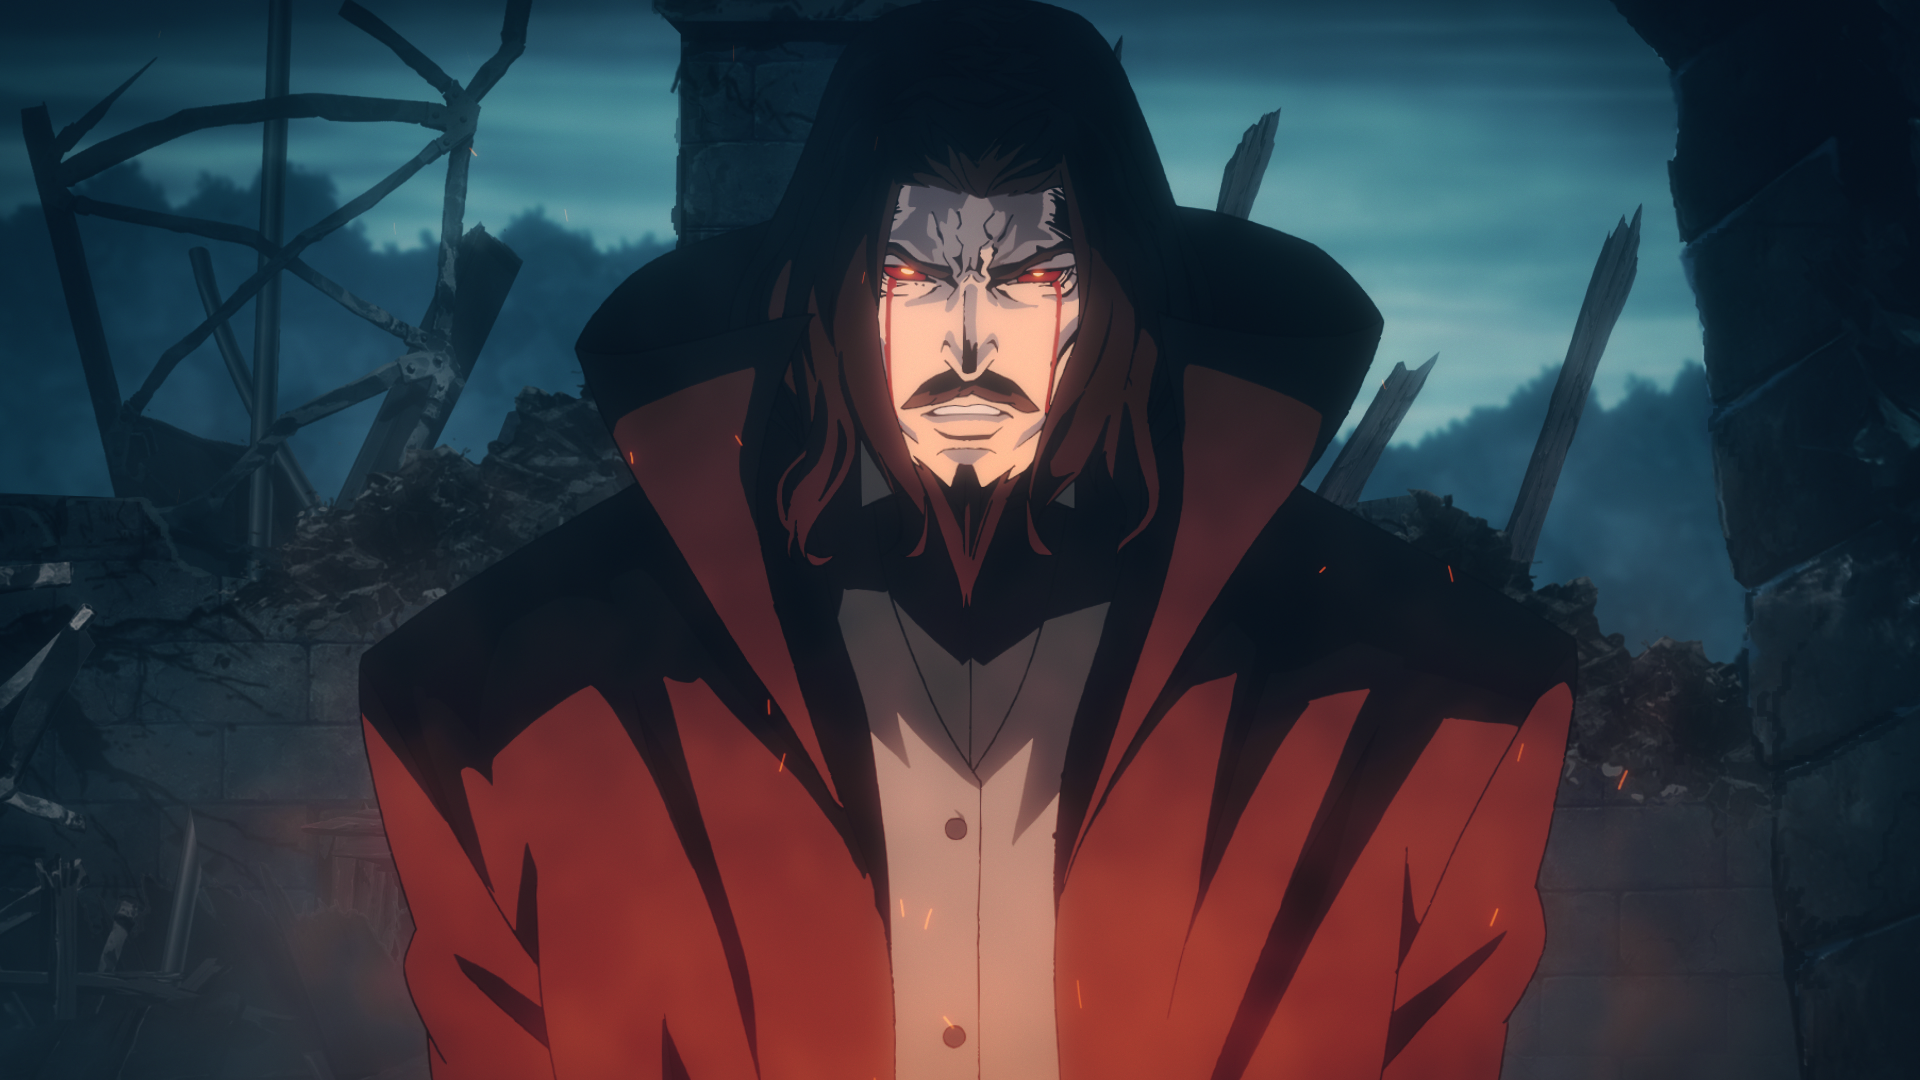 GrahamMcTavish_Dracula_Castlevania